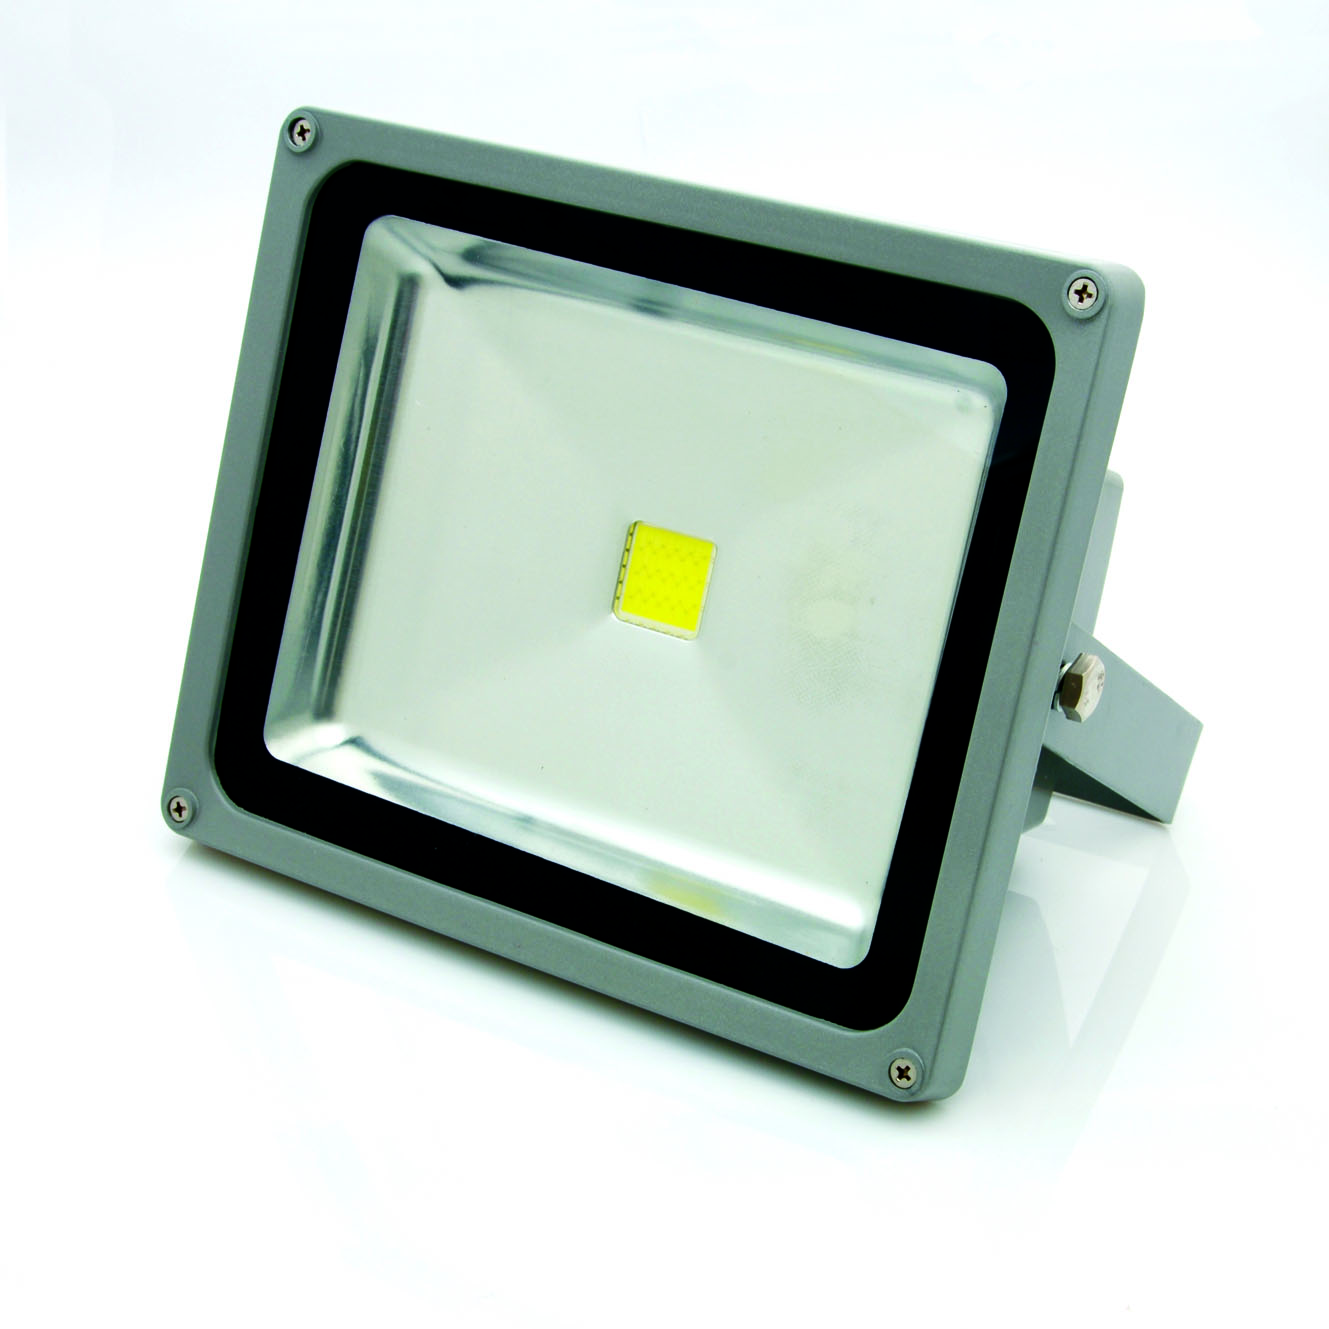 PROIECTOR LED EXTERIOR CLASIC 20W LUMINA ALBA RECE